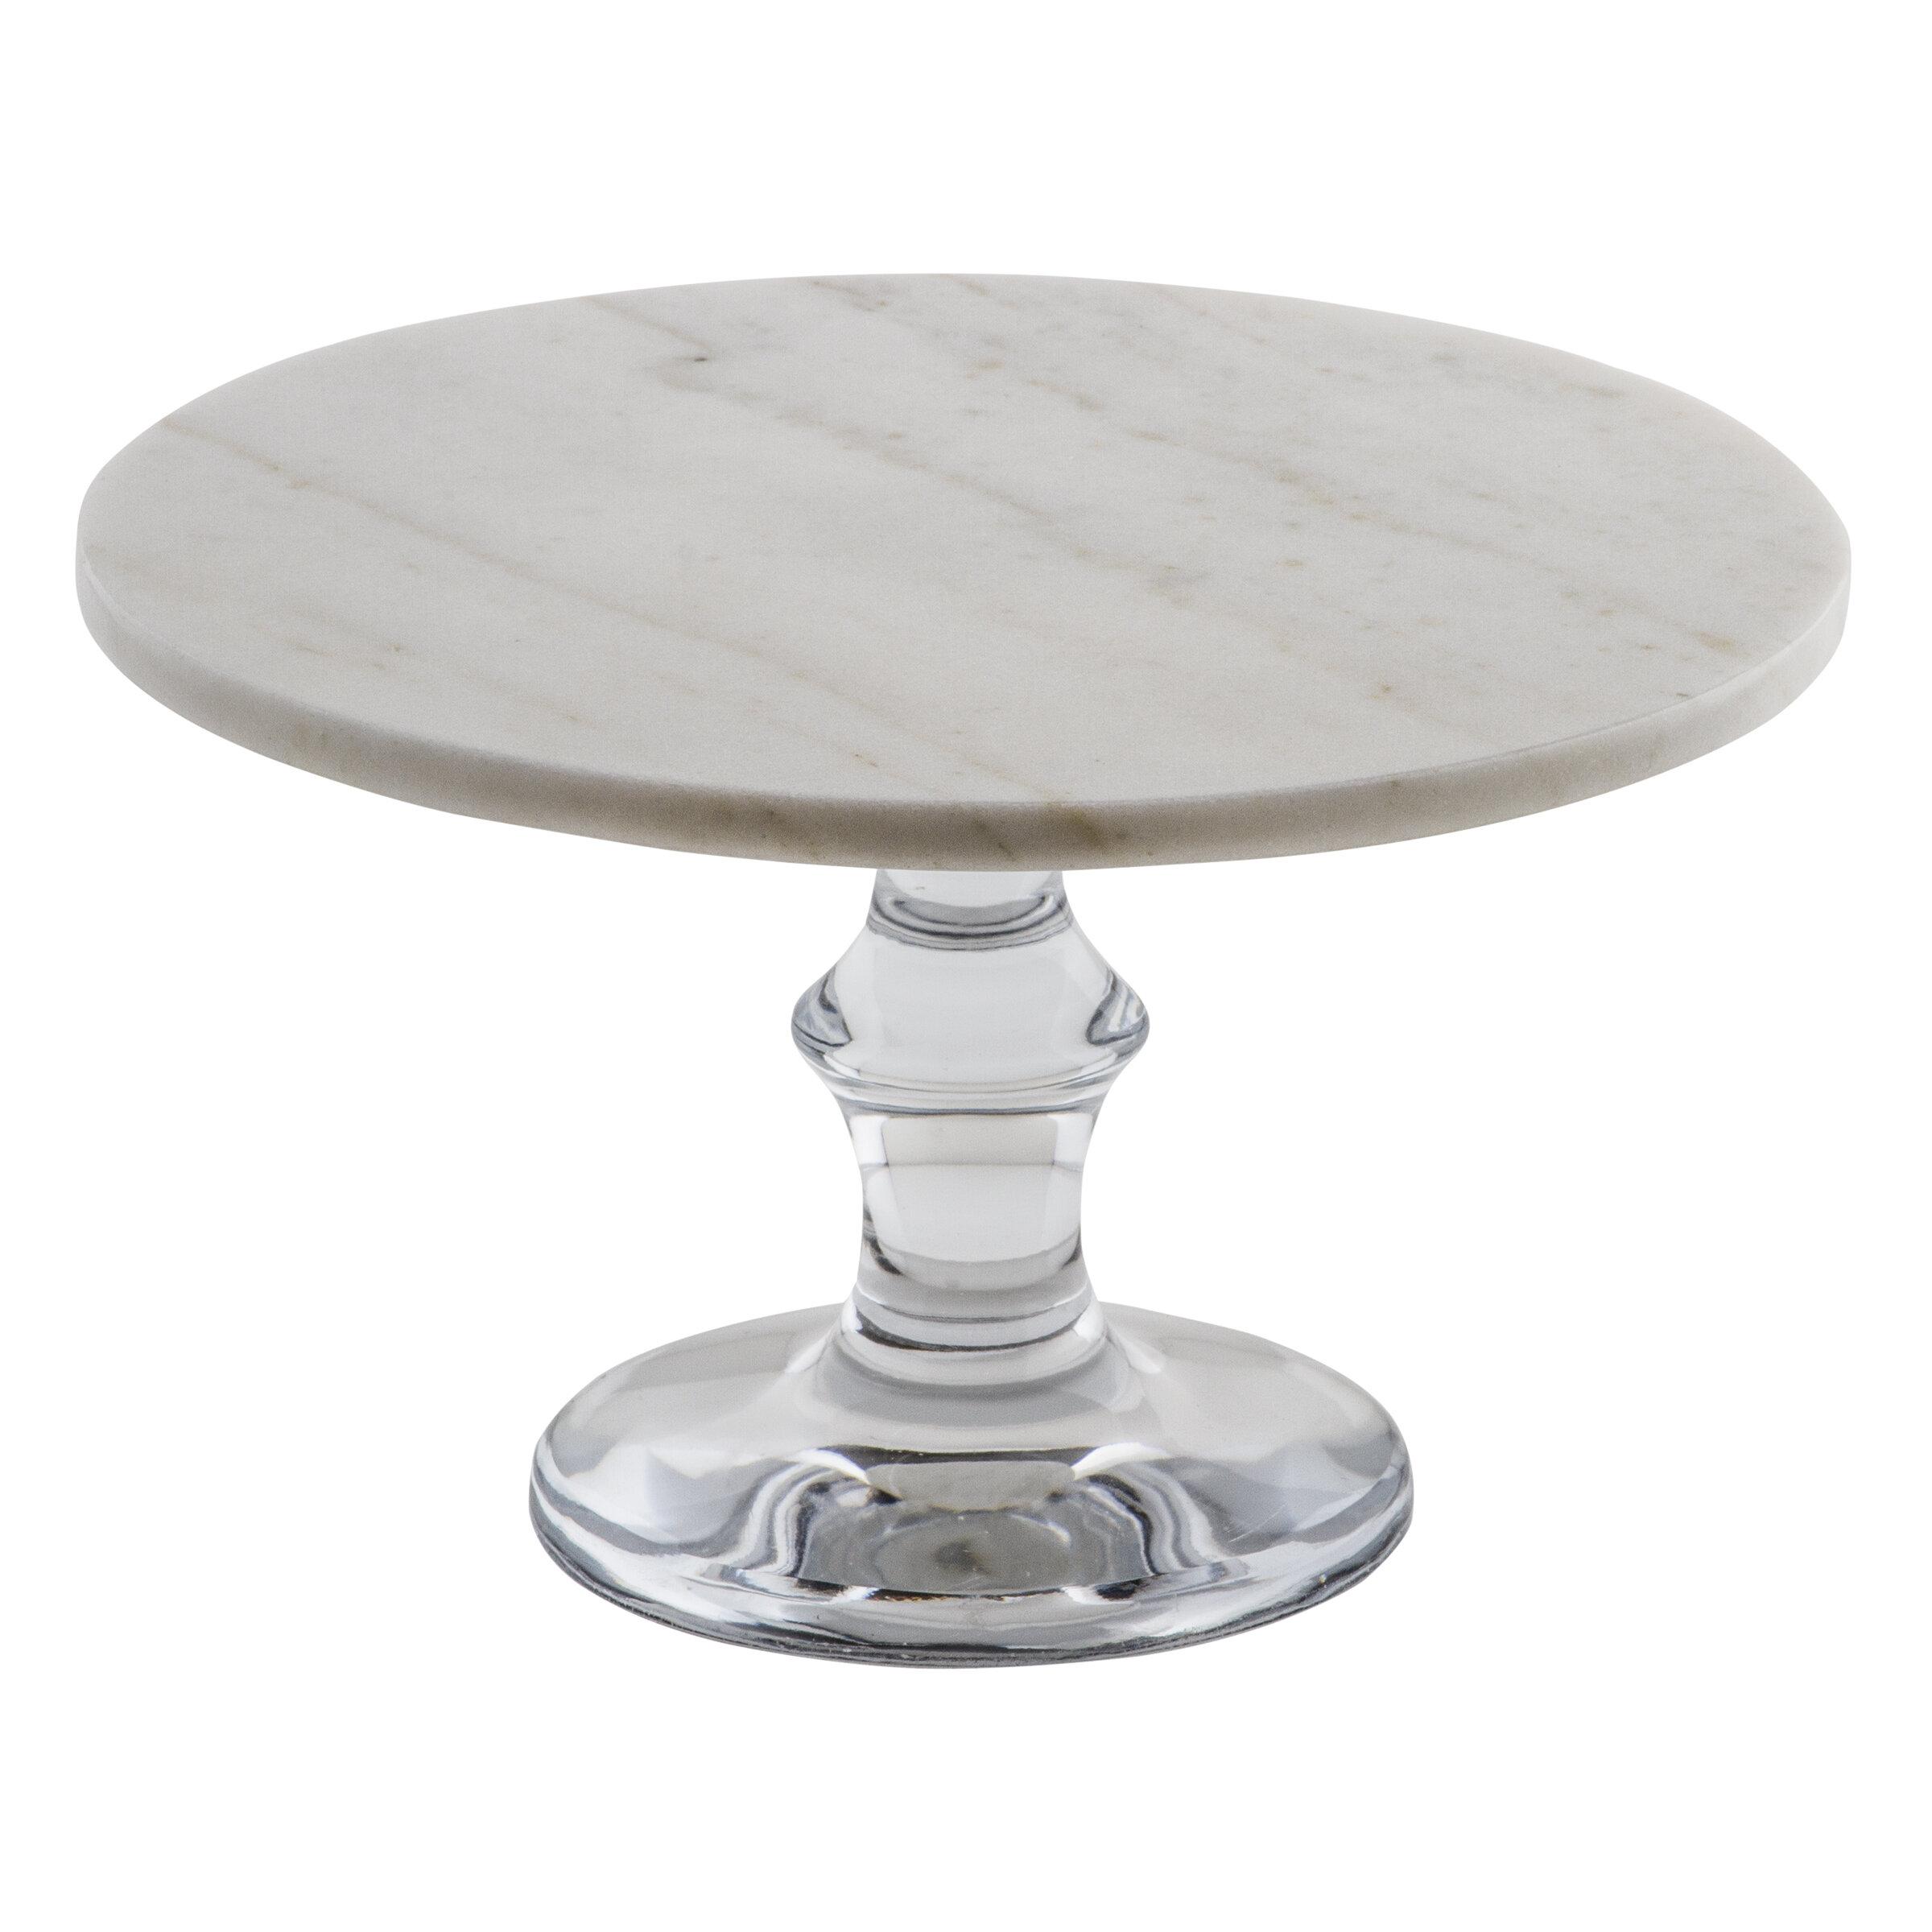 pedestal copy rimmed rosanna bon shop leo turquoise bella hue decor img small stand soft cake